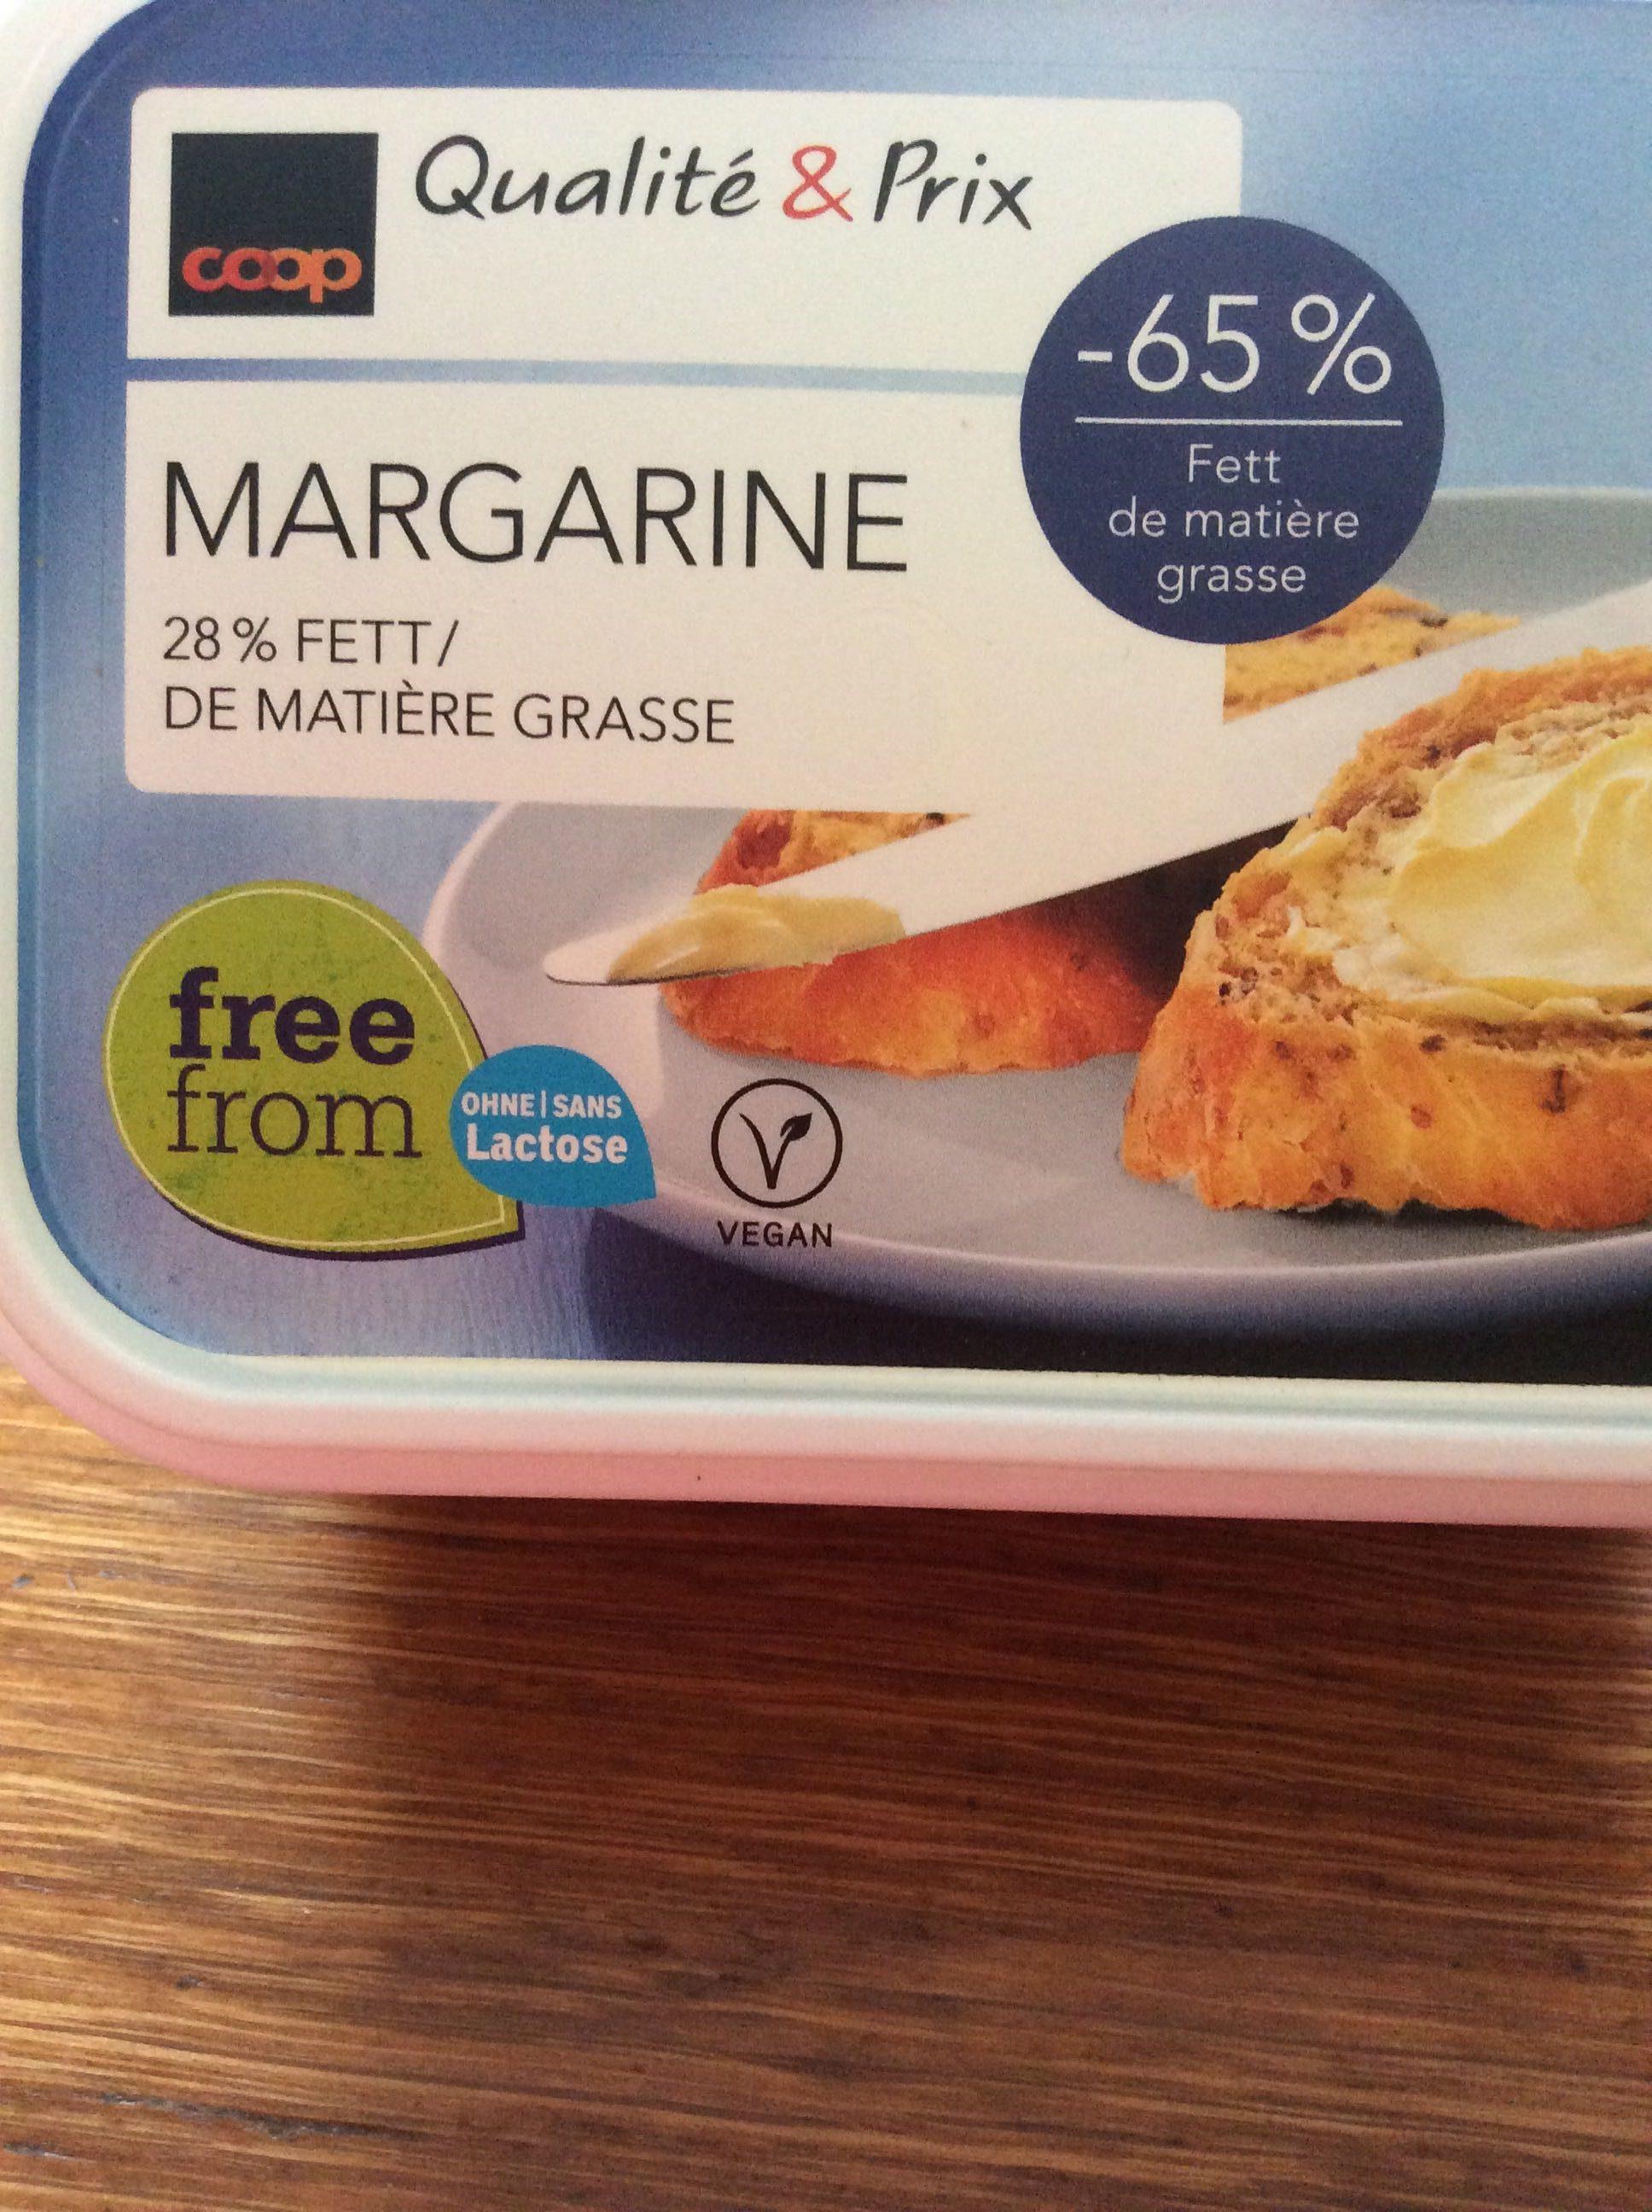 Coop Qualité & Prix Margarine - Product - fr